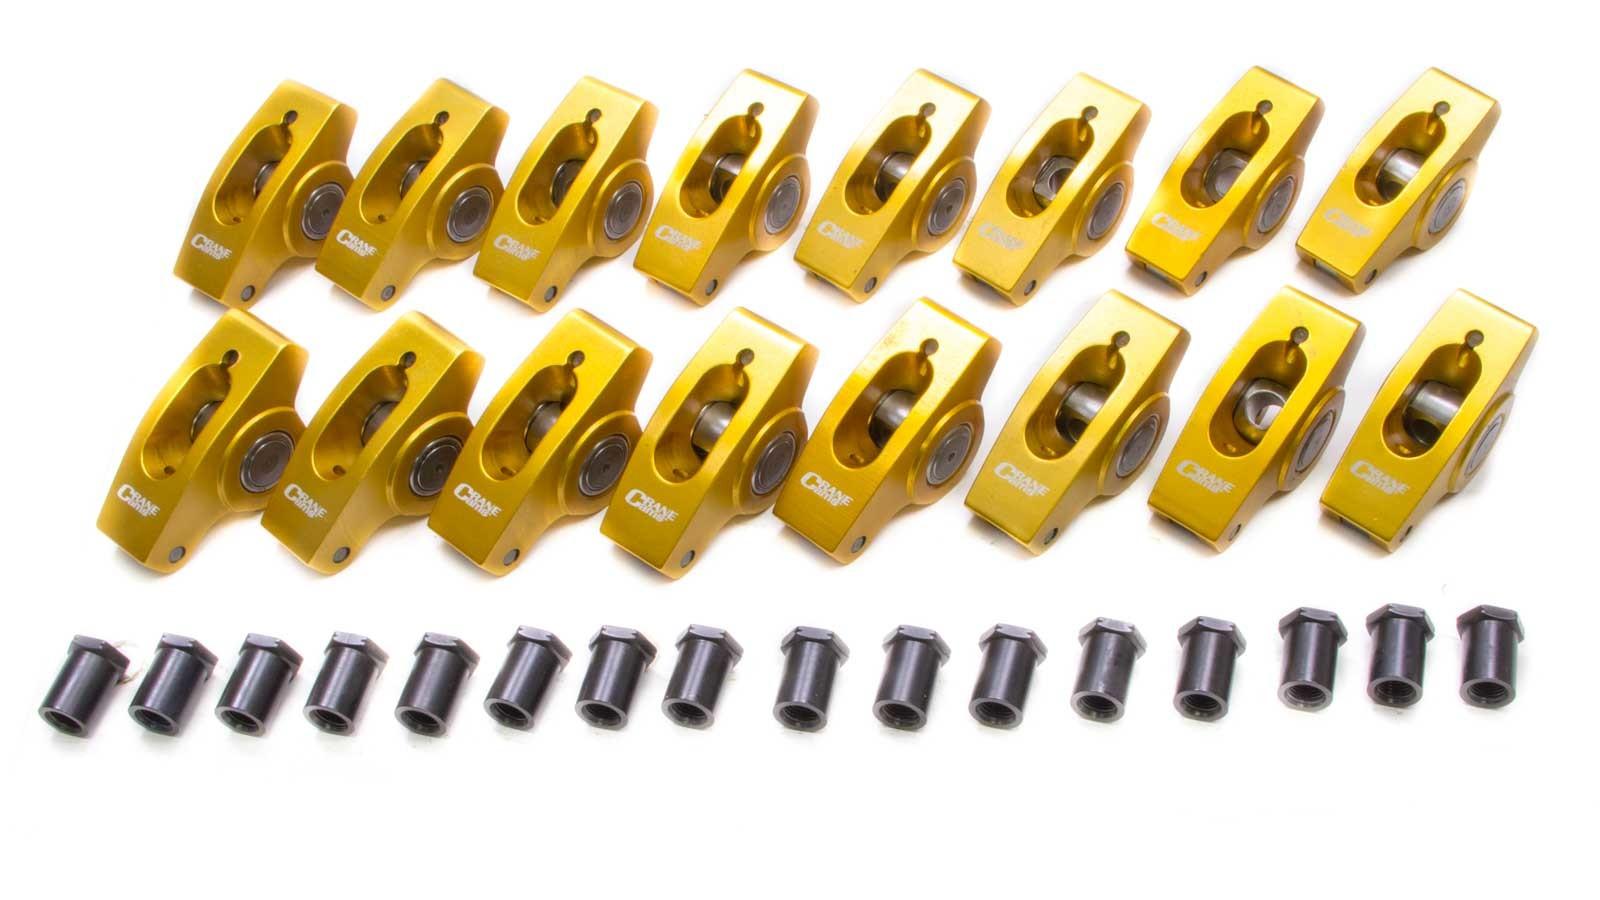 Sbc Alm. Roller Rocker Arms-1.50 Ratio-3/8 Stud